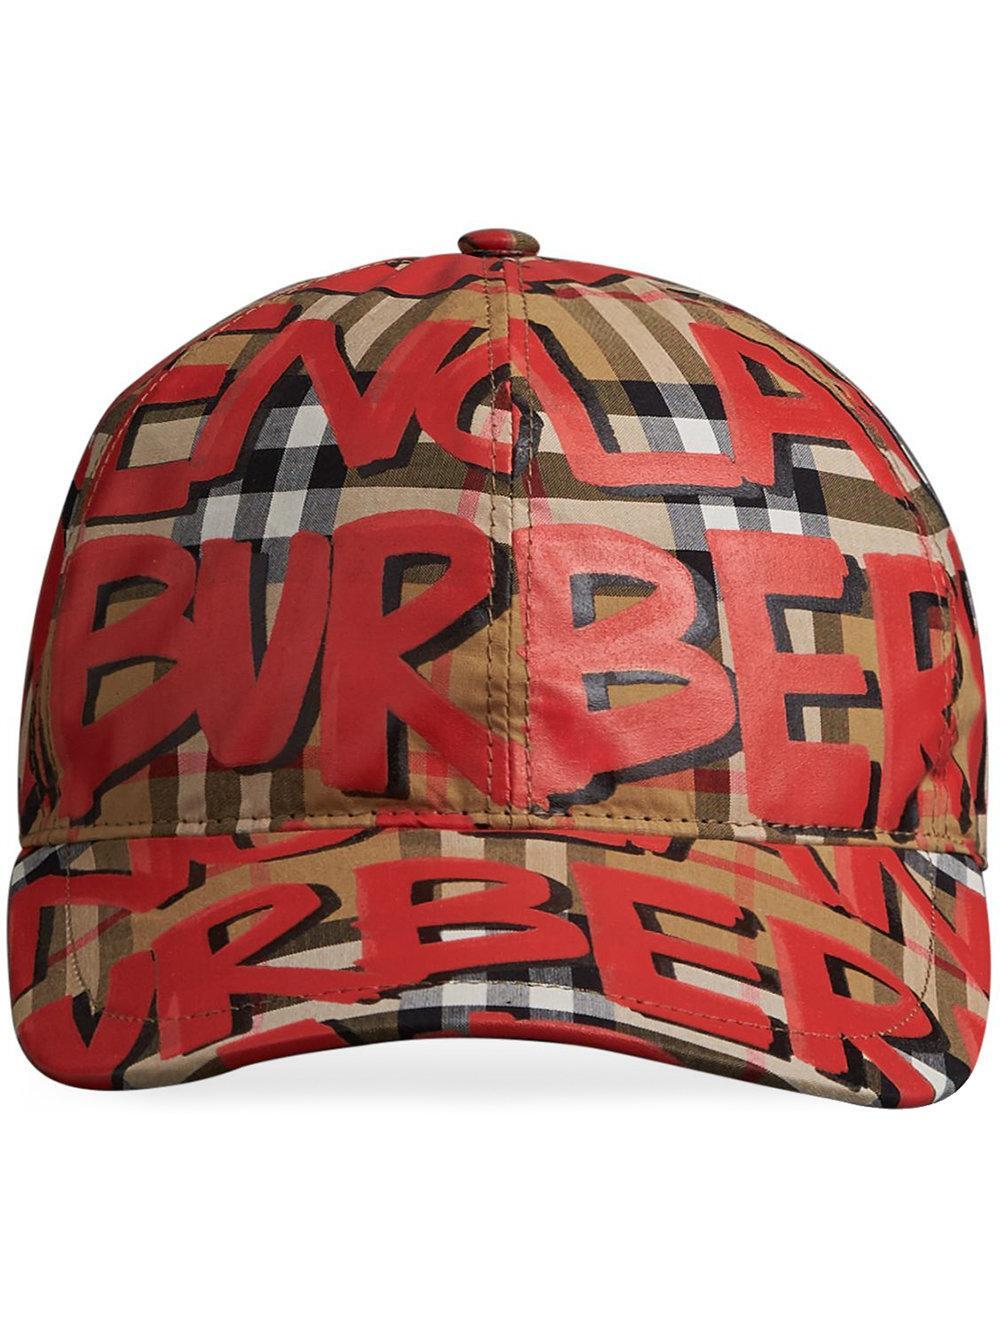 3b4a6da0fc7fed Burberry Graffiti Vintage Check Baseball Cap In Red | ModeSens